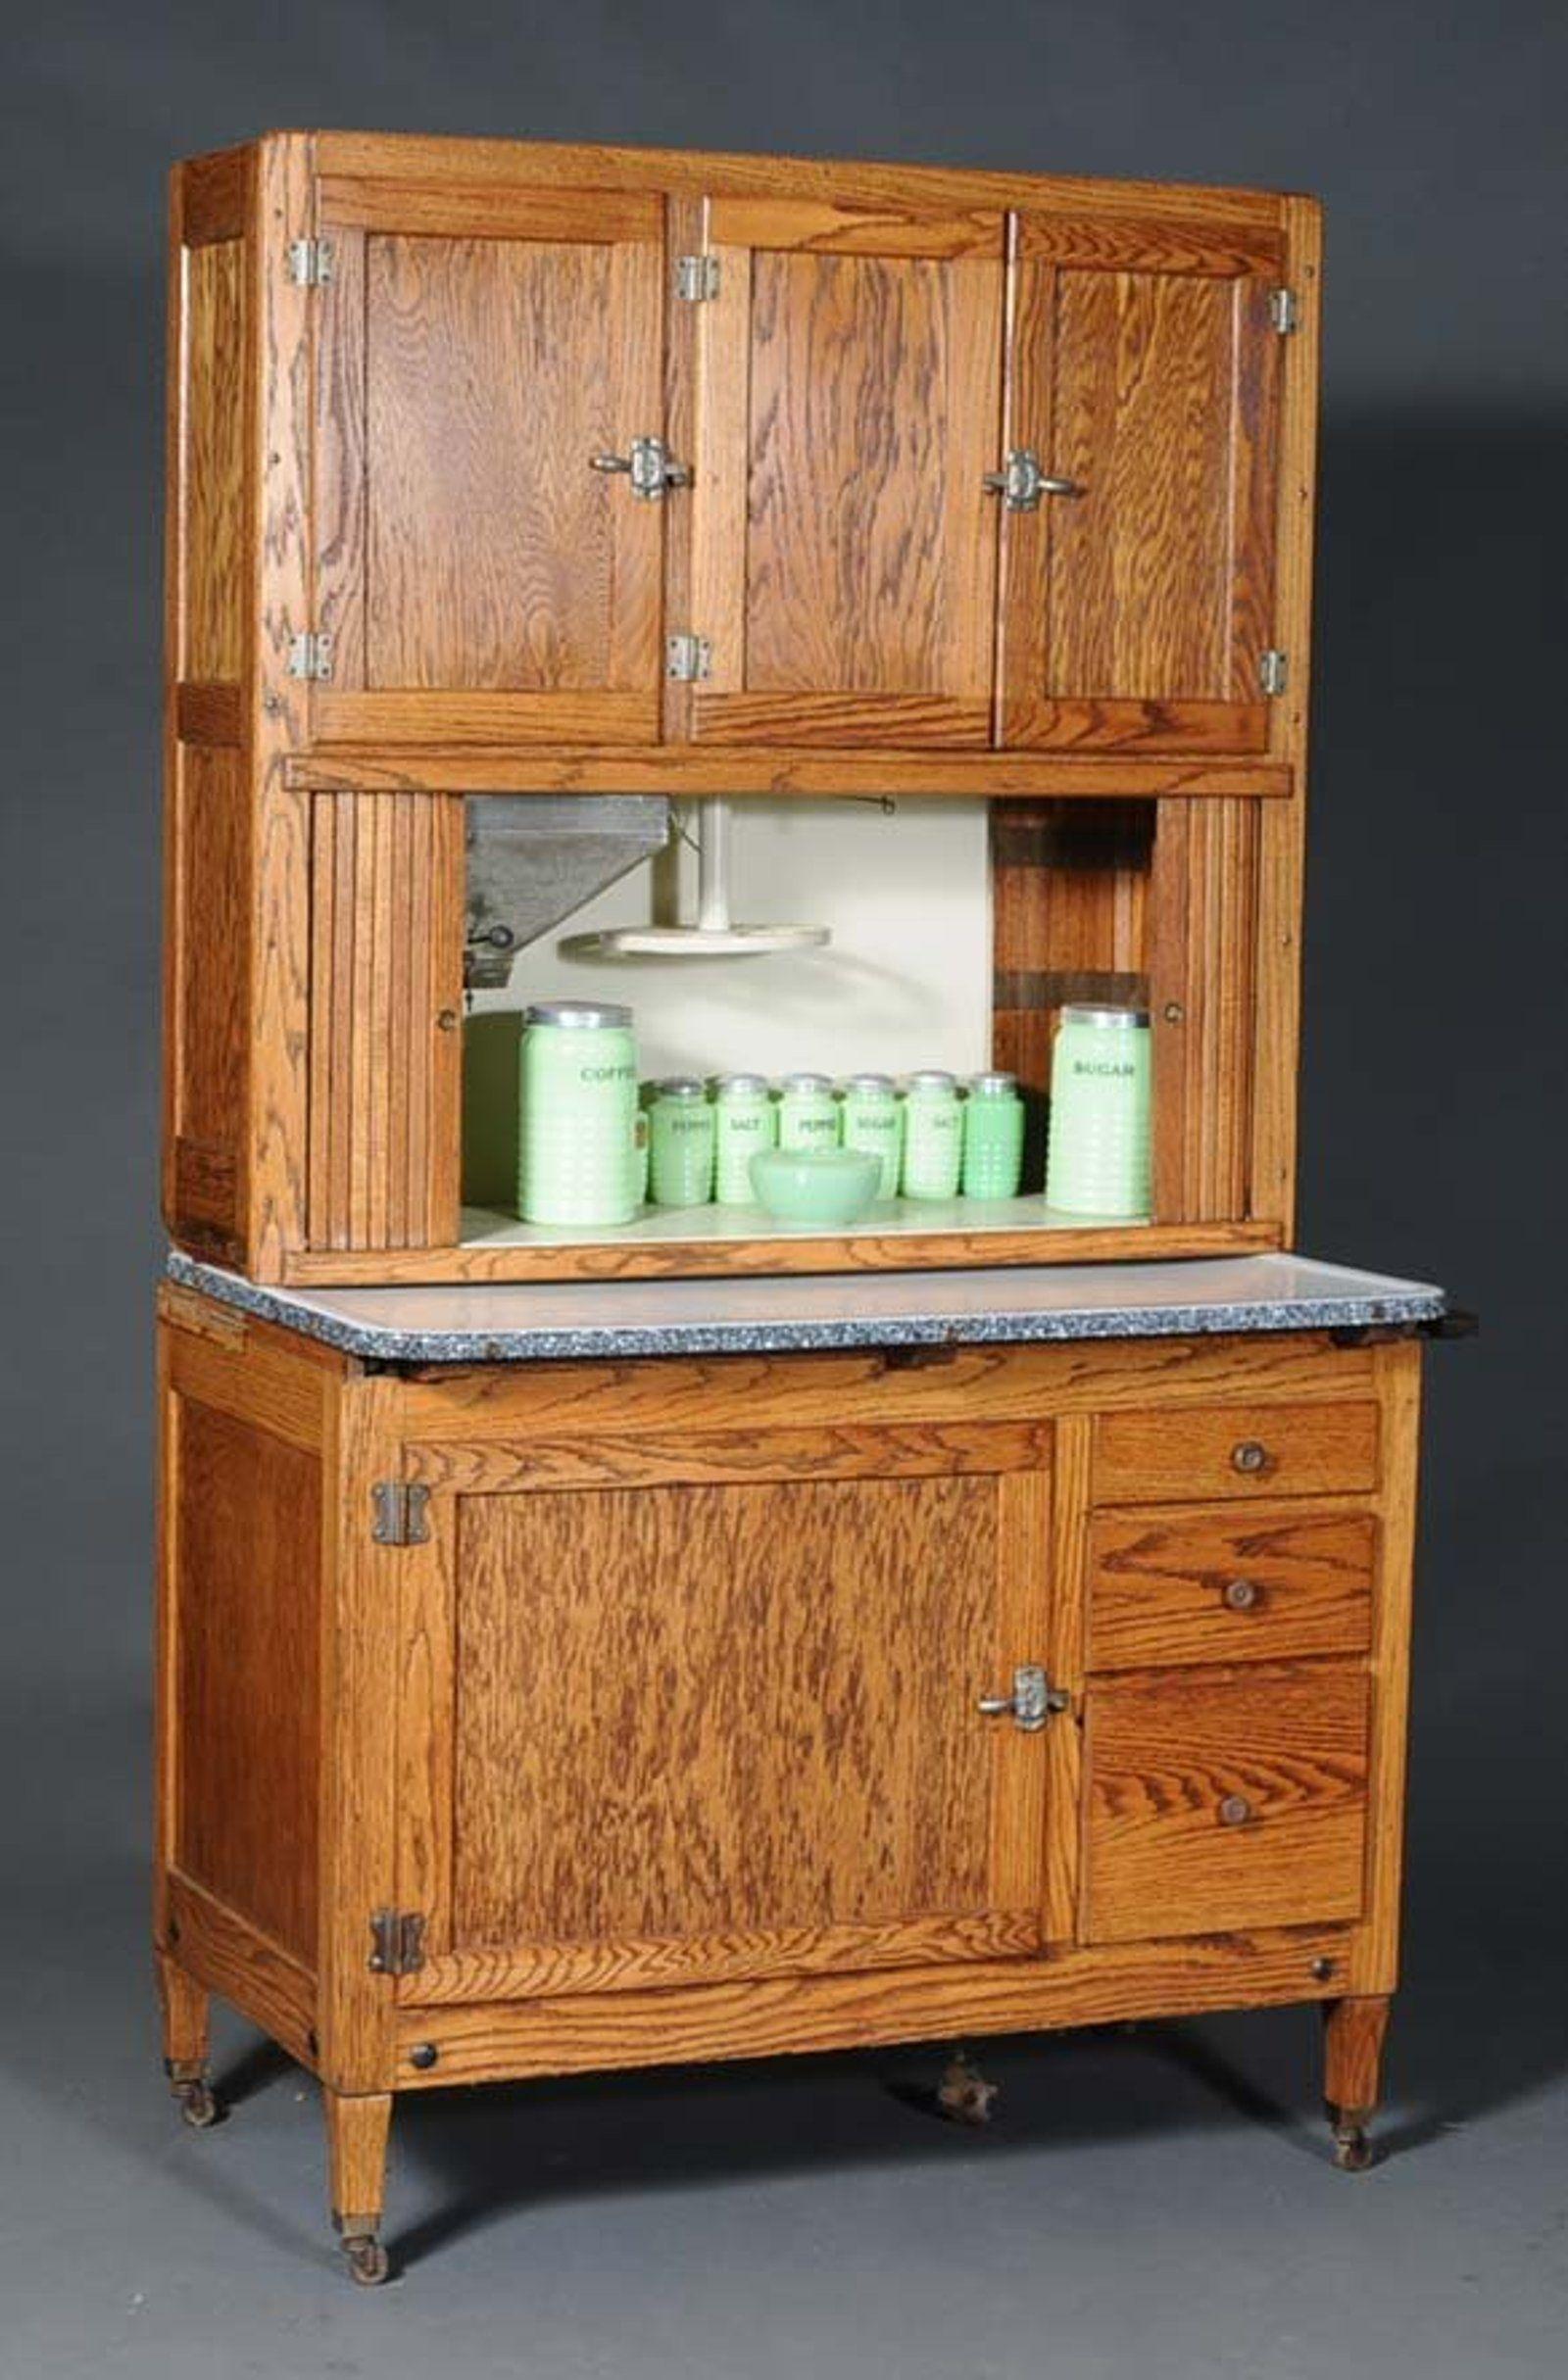 Lot 284 Hoosier Oak Kitchen Cabinet Number 0284 Starting Bid